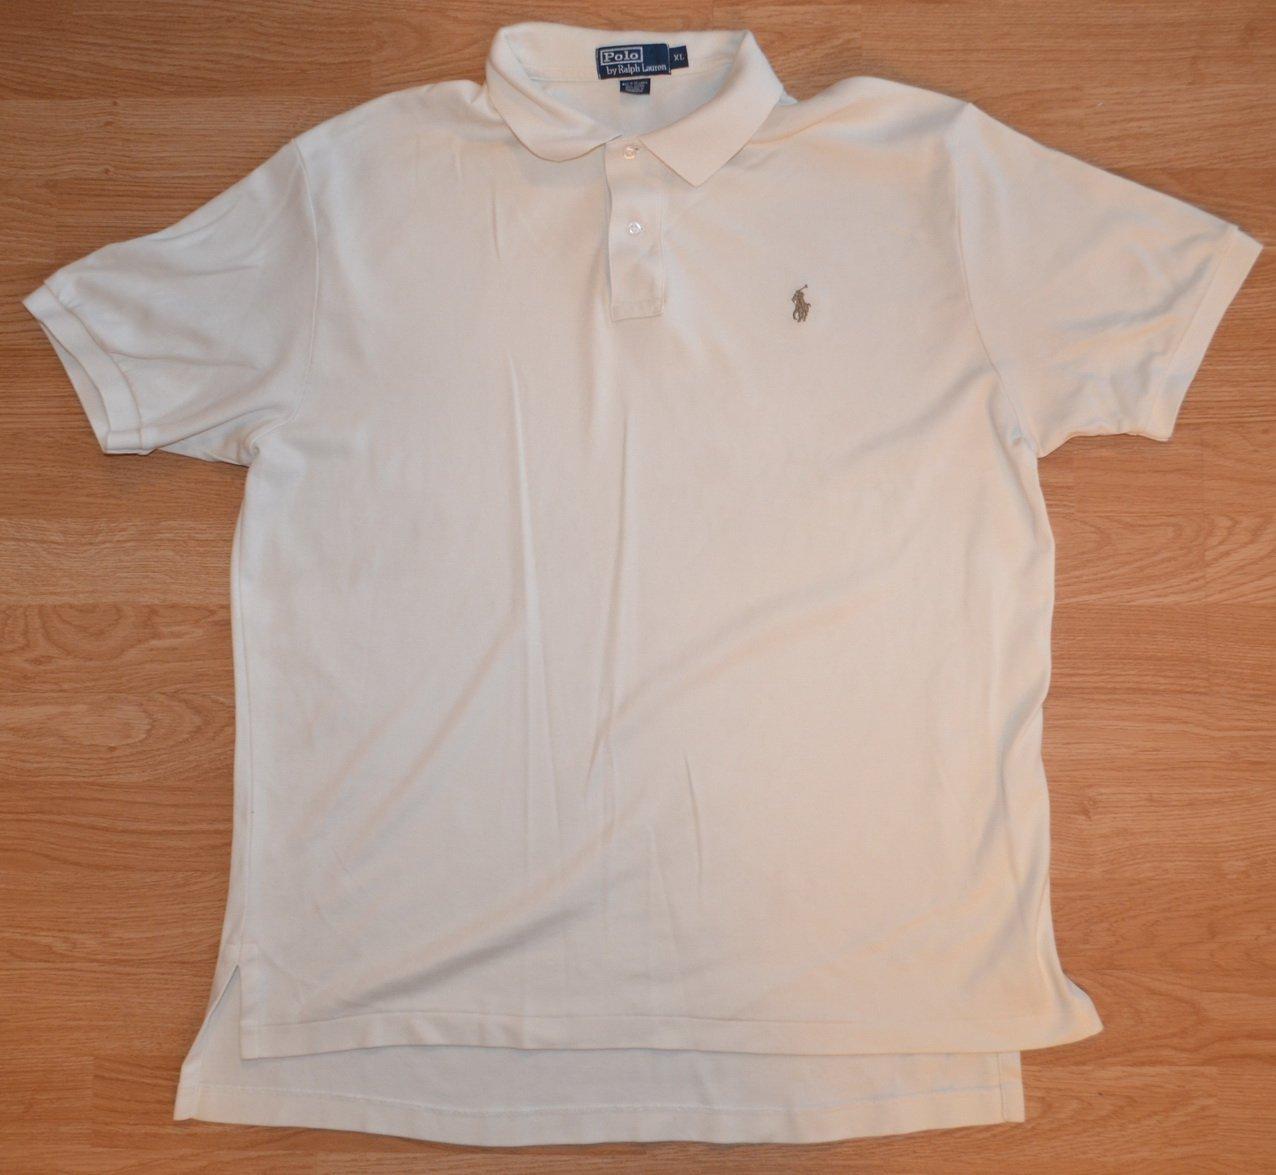 N991 Men's Polo shirt Ralph Lauren Size XL 100% cotton